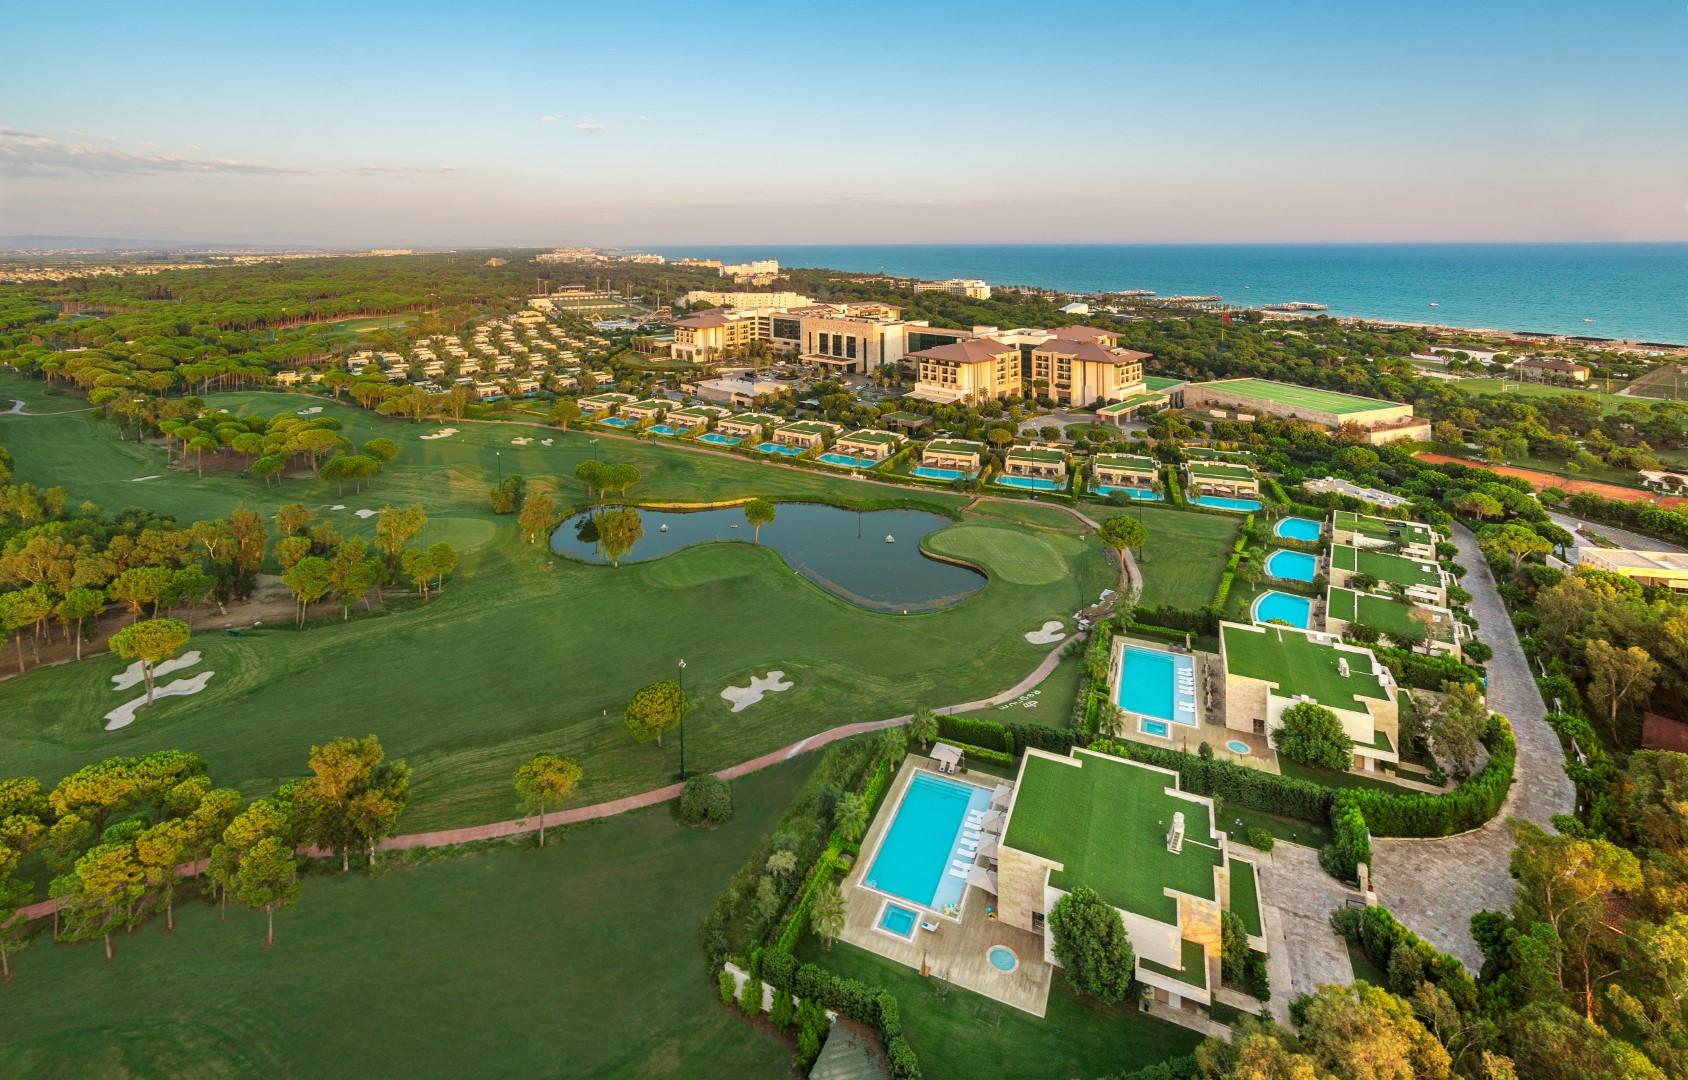 Antalya Belek hotel Regnum Carya Golf Resort